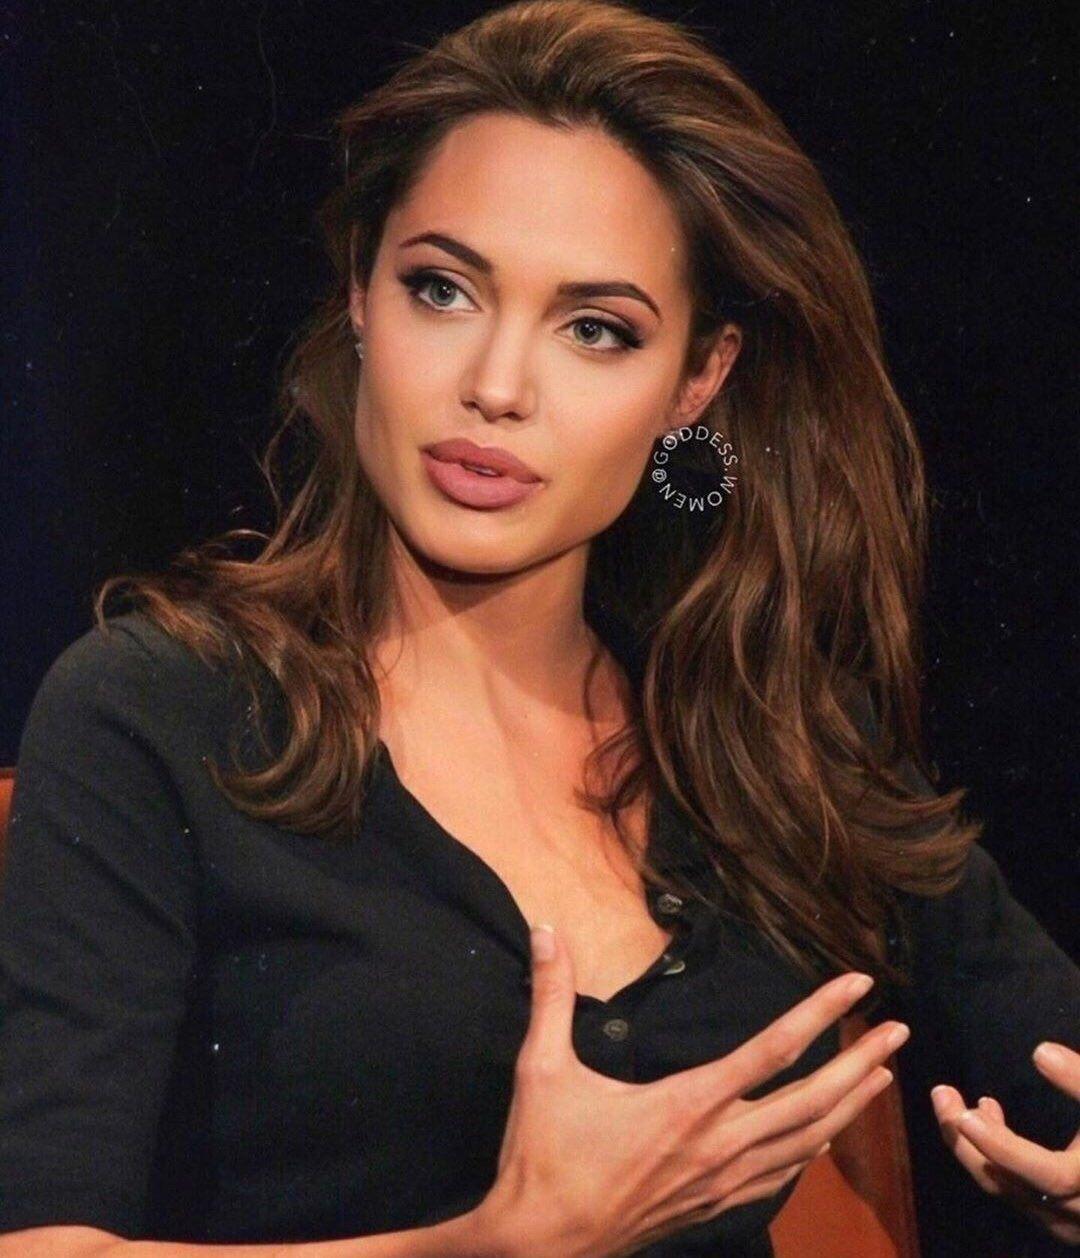 Epingle Sur Angelina Jolie